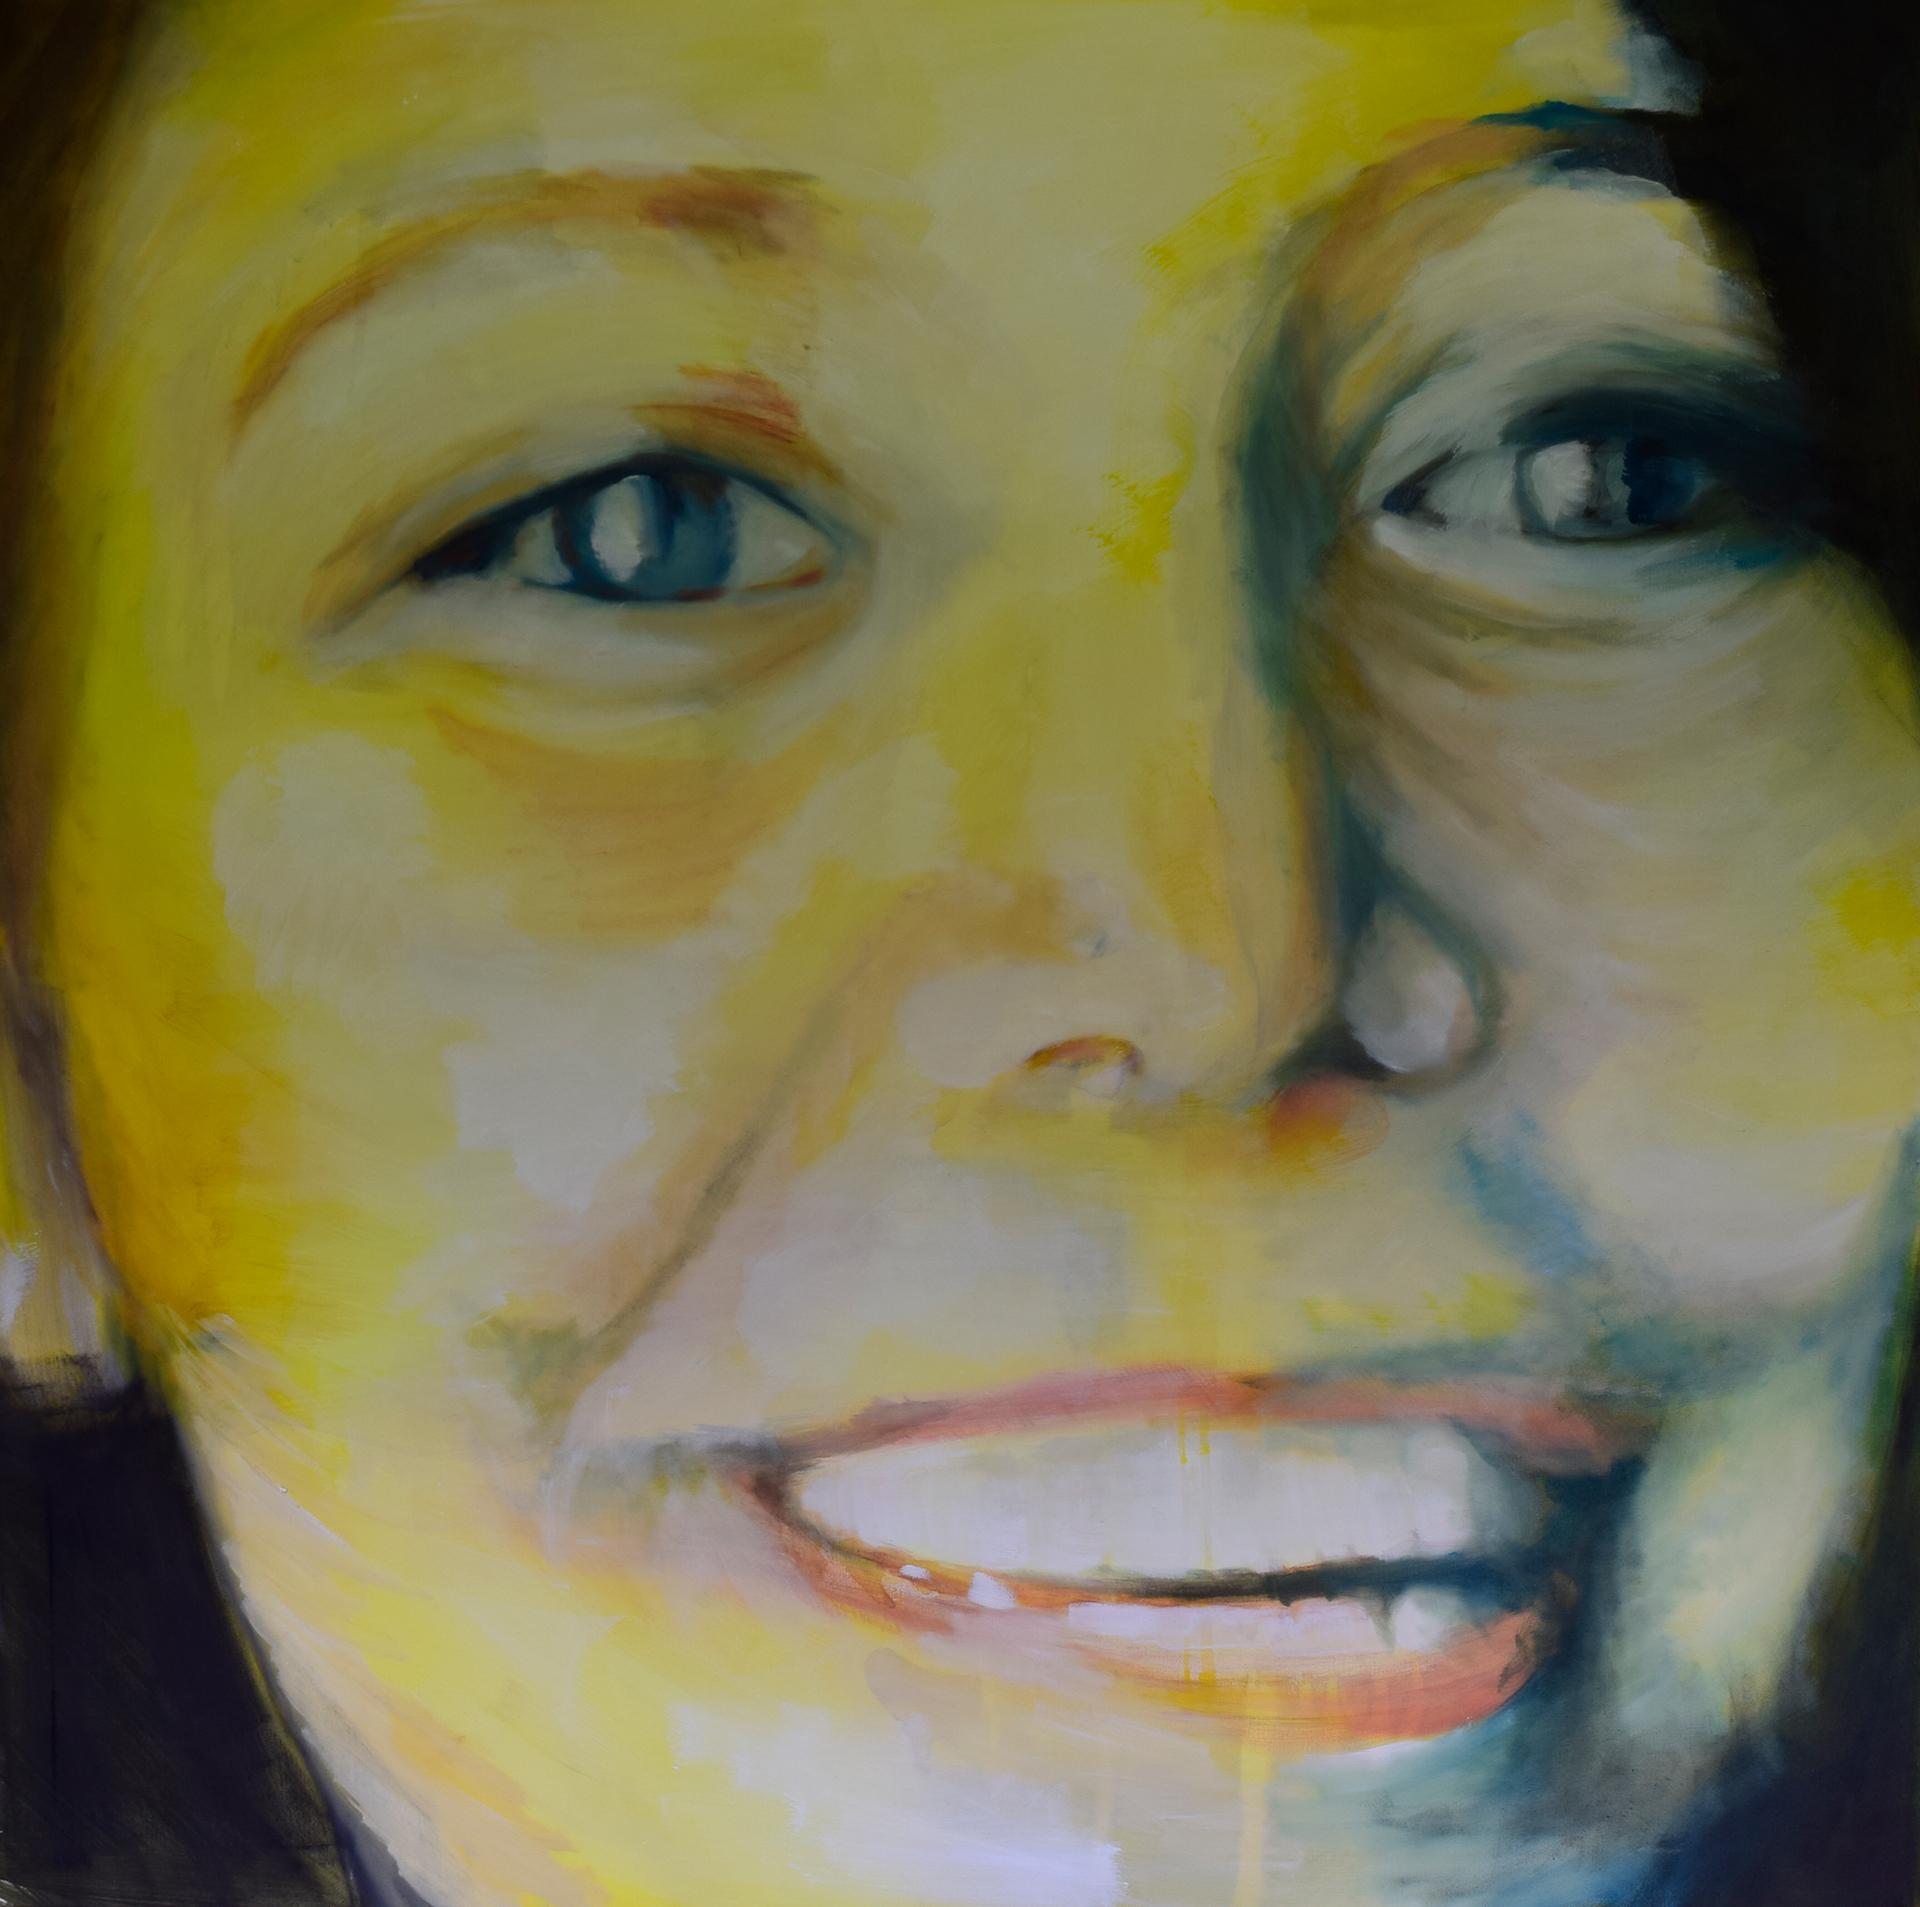 cheyenne 2014 | ieli sin glin